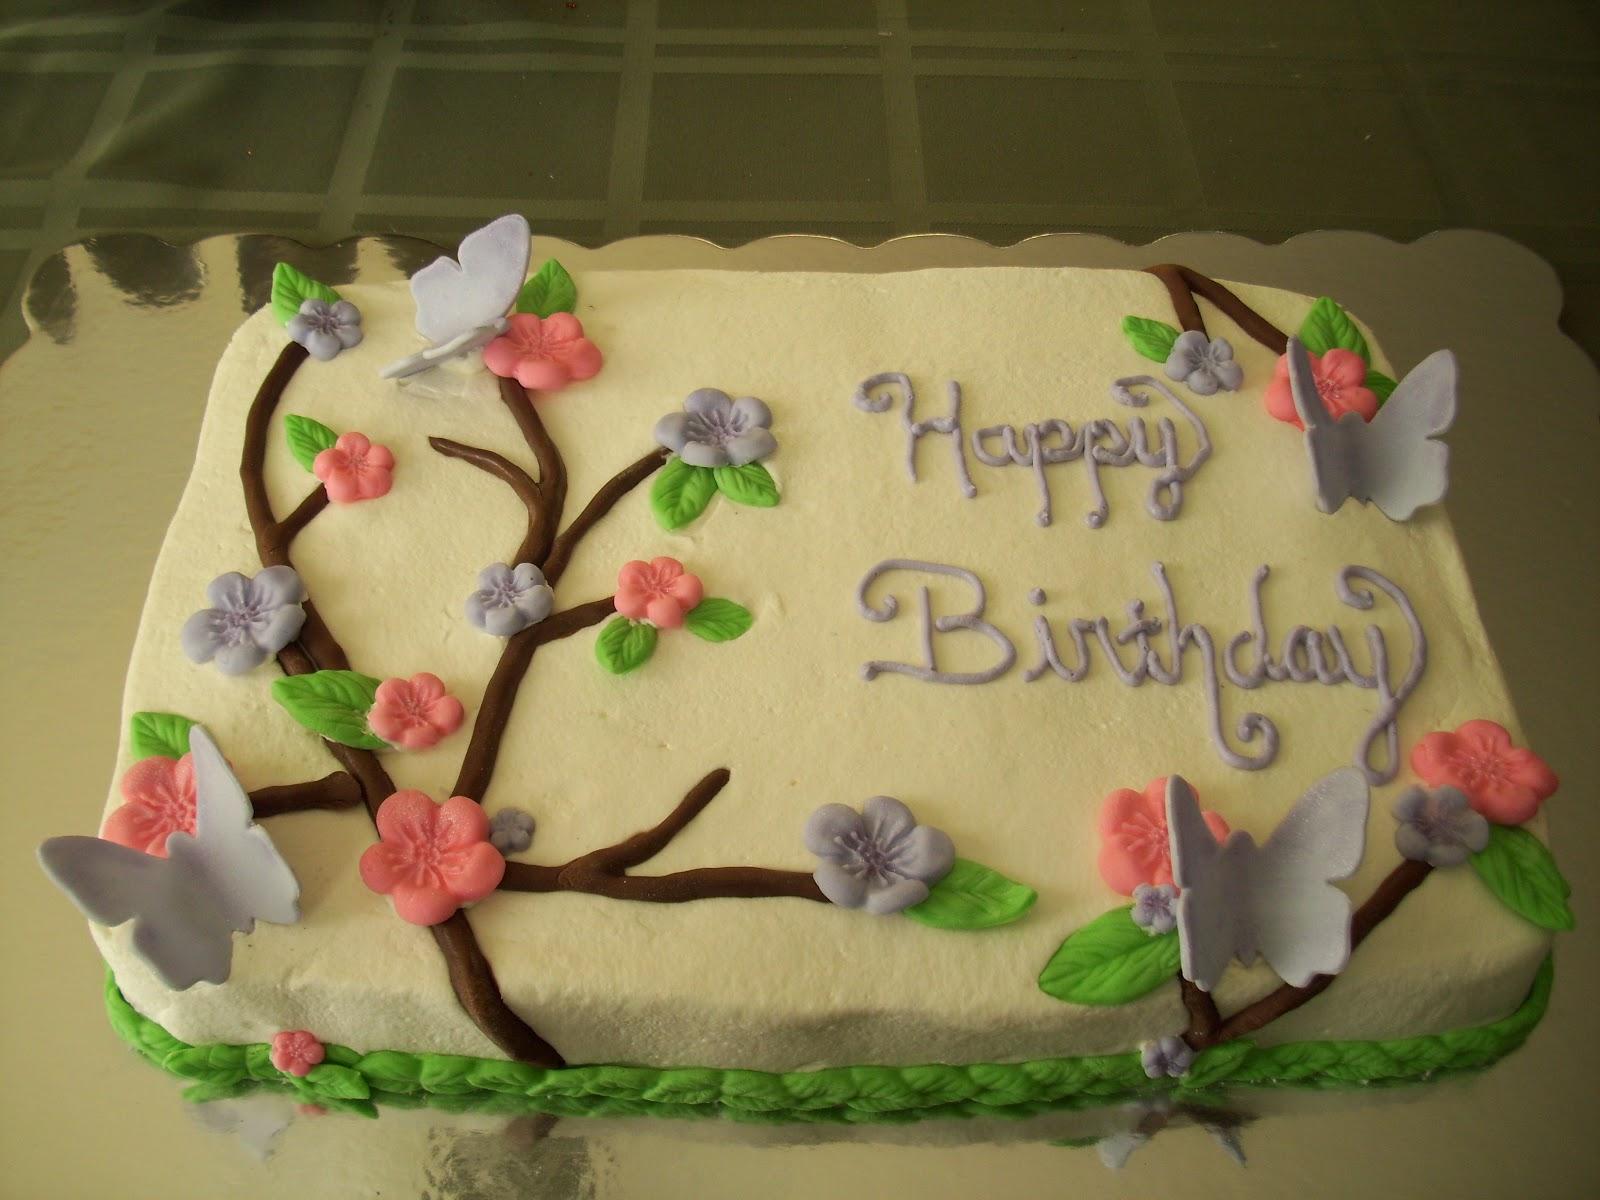 Enjoyable 8 Birthday Sheet Cakes For Ladies Photo 40Th Birthday Sheet Cake Personalised Birthday Cards Cominlily Jamesorg